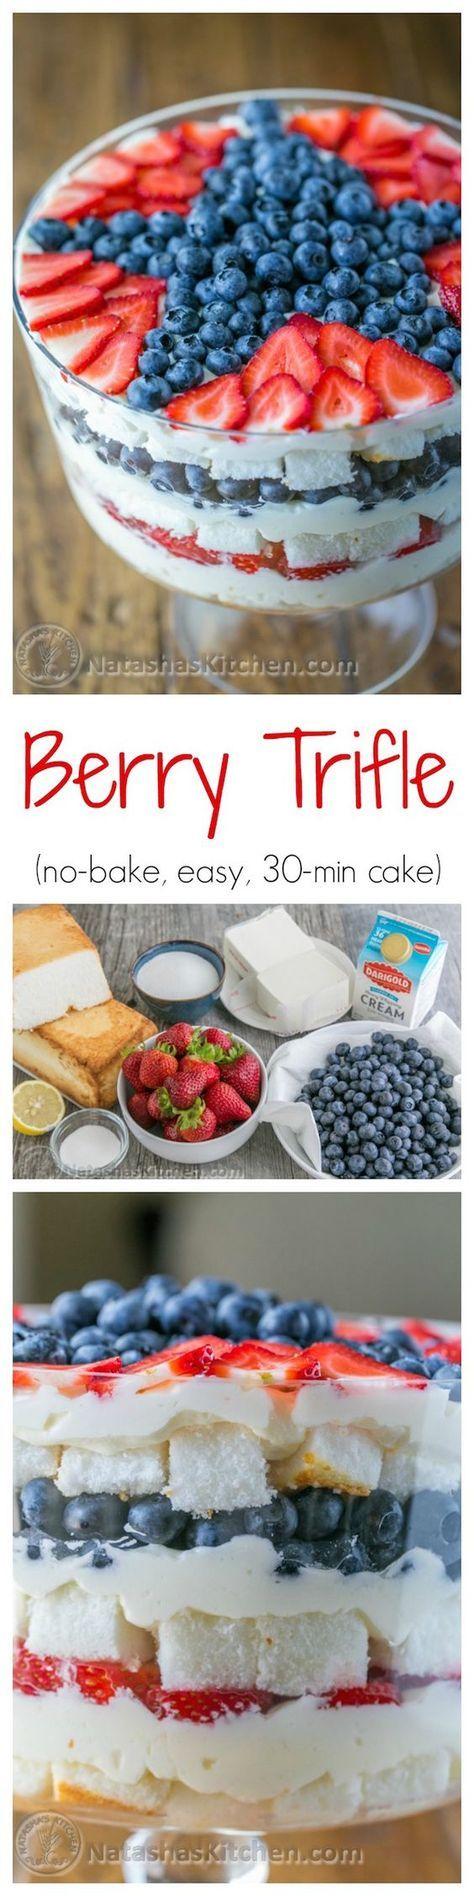 No-Bake Strawberry Blueberry Trifle